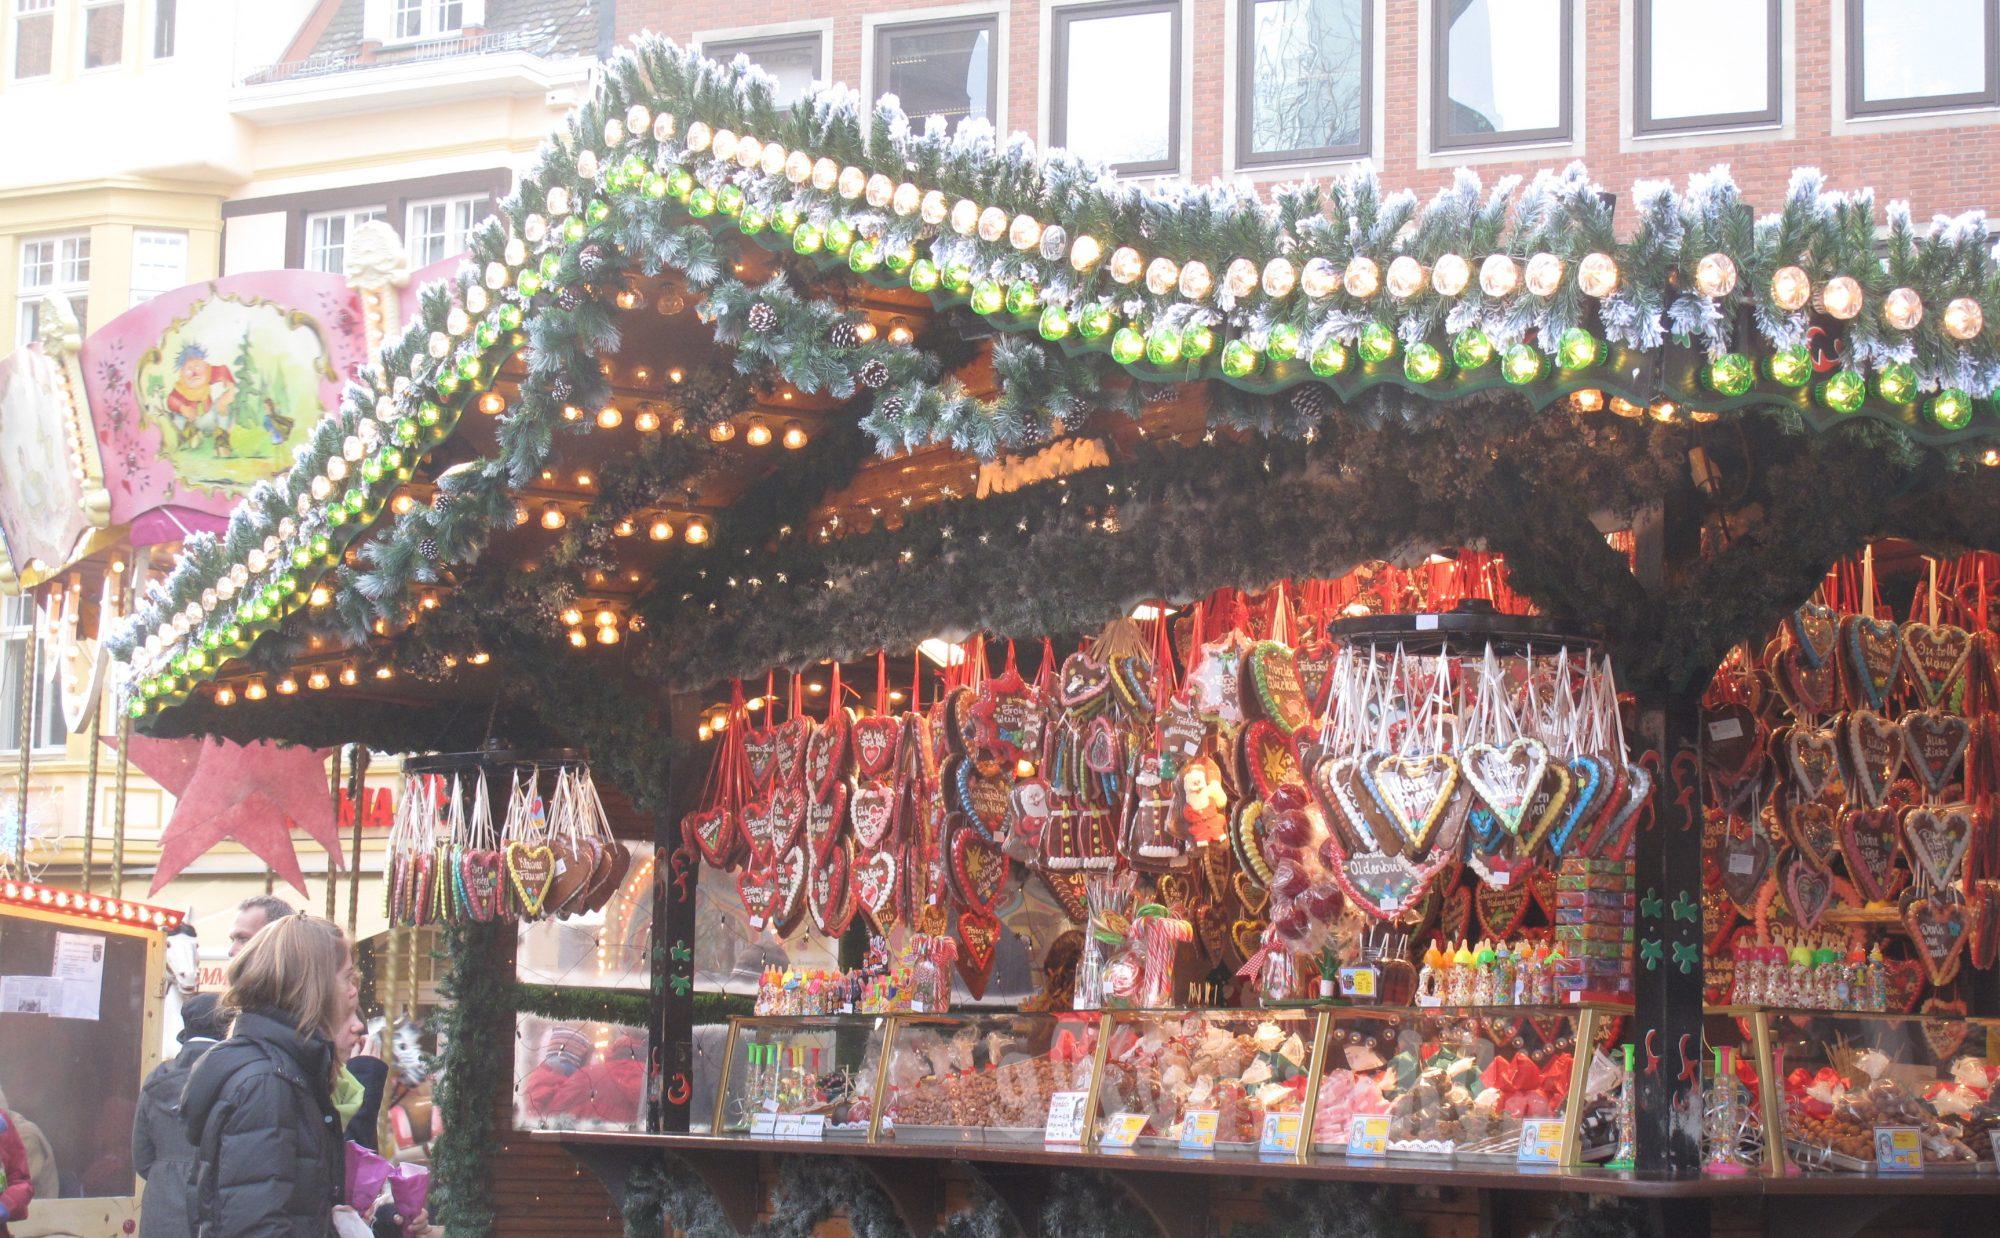 Kerstmarkt Oldenburg 2019